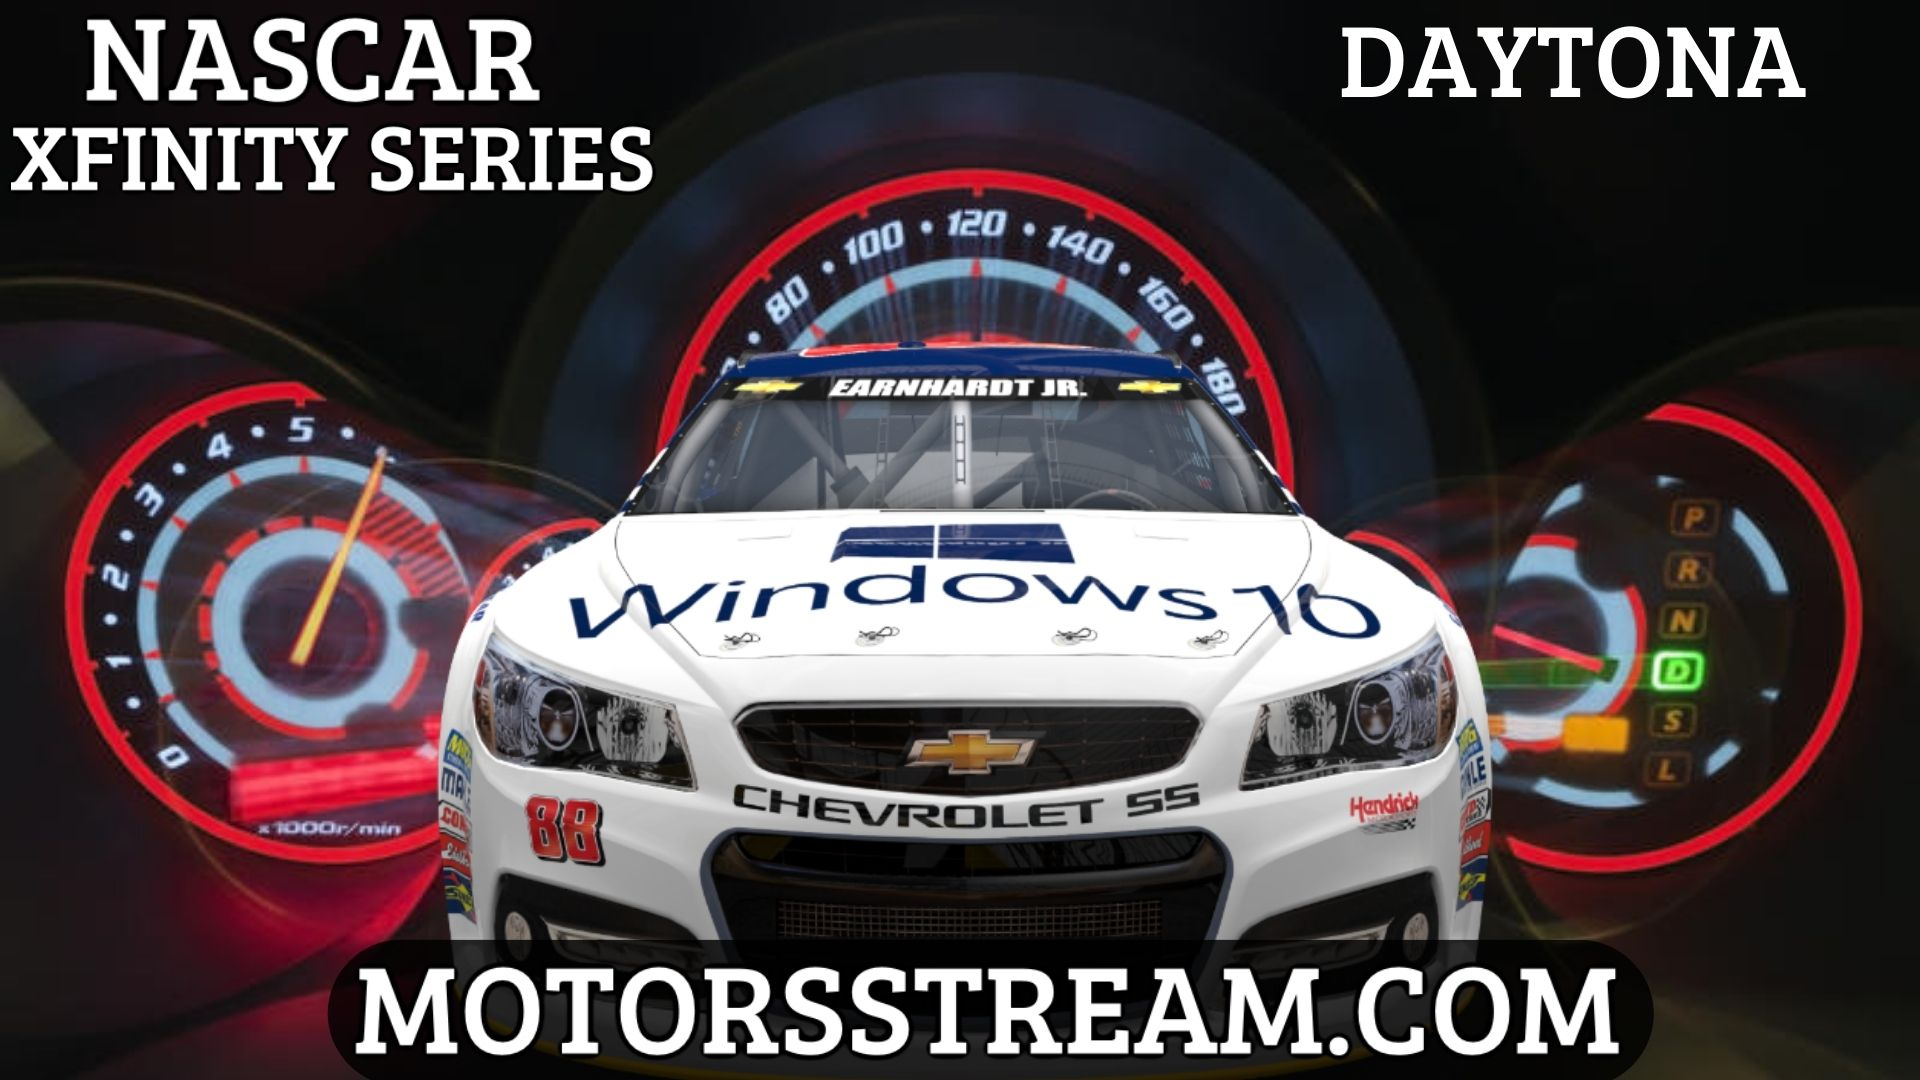 NASCAR Xfinity Series Daytona RC Live Stream